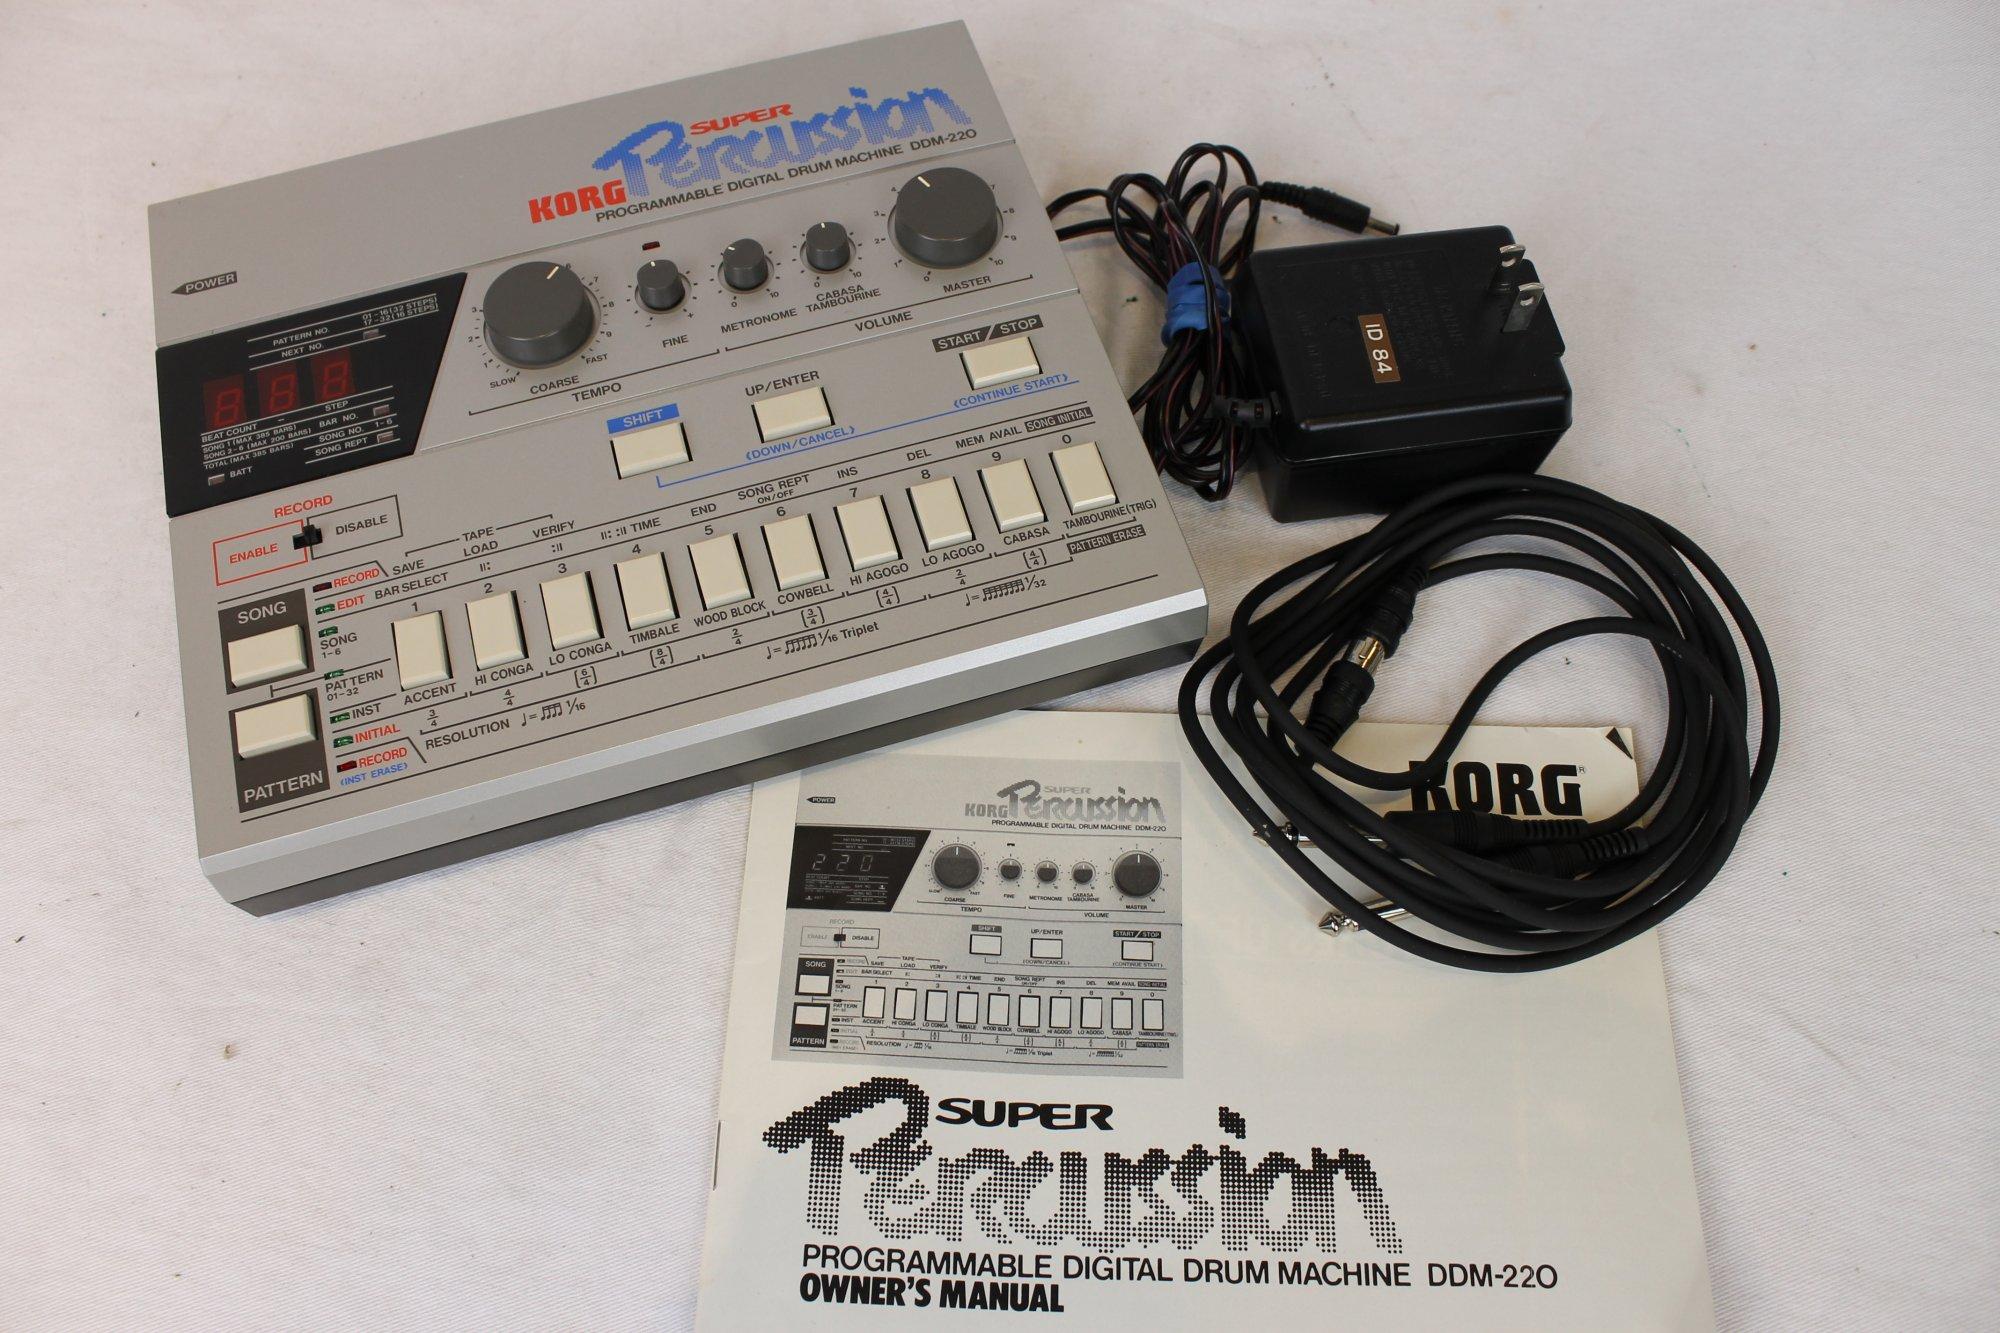 Korg DDM-220 Super Percussion Digital Drum Machine